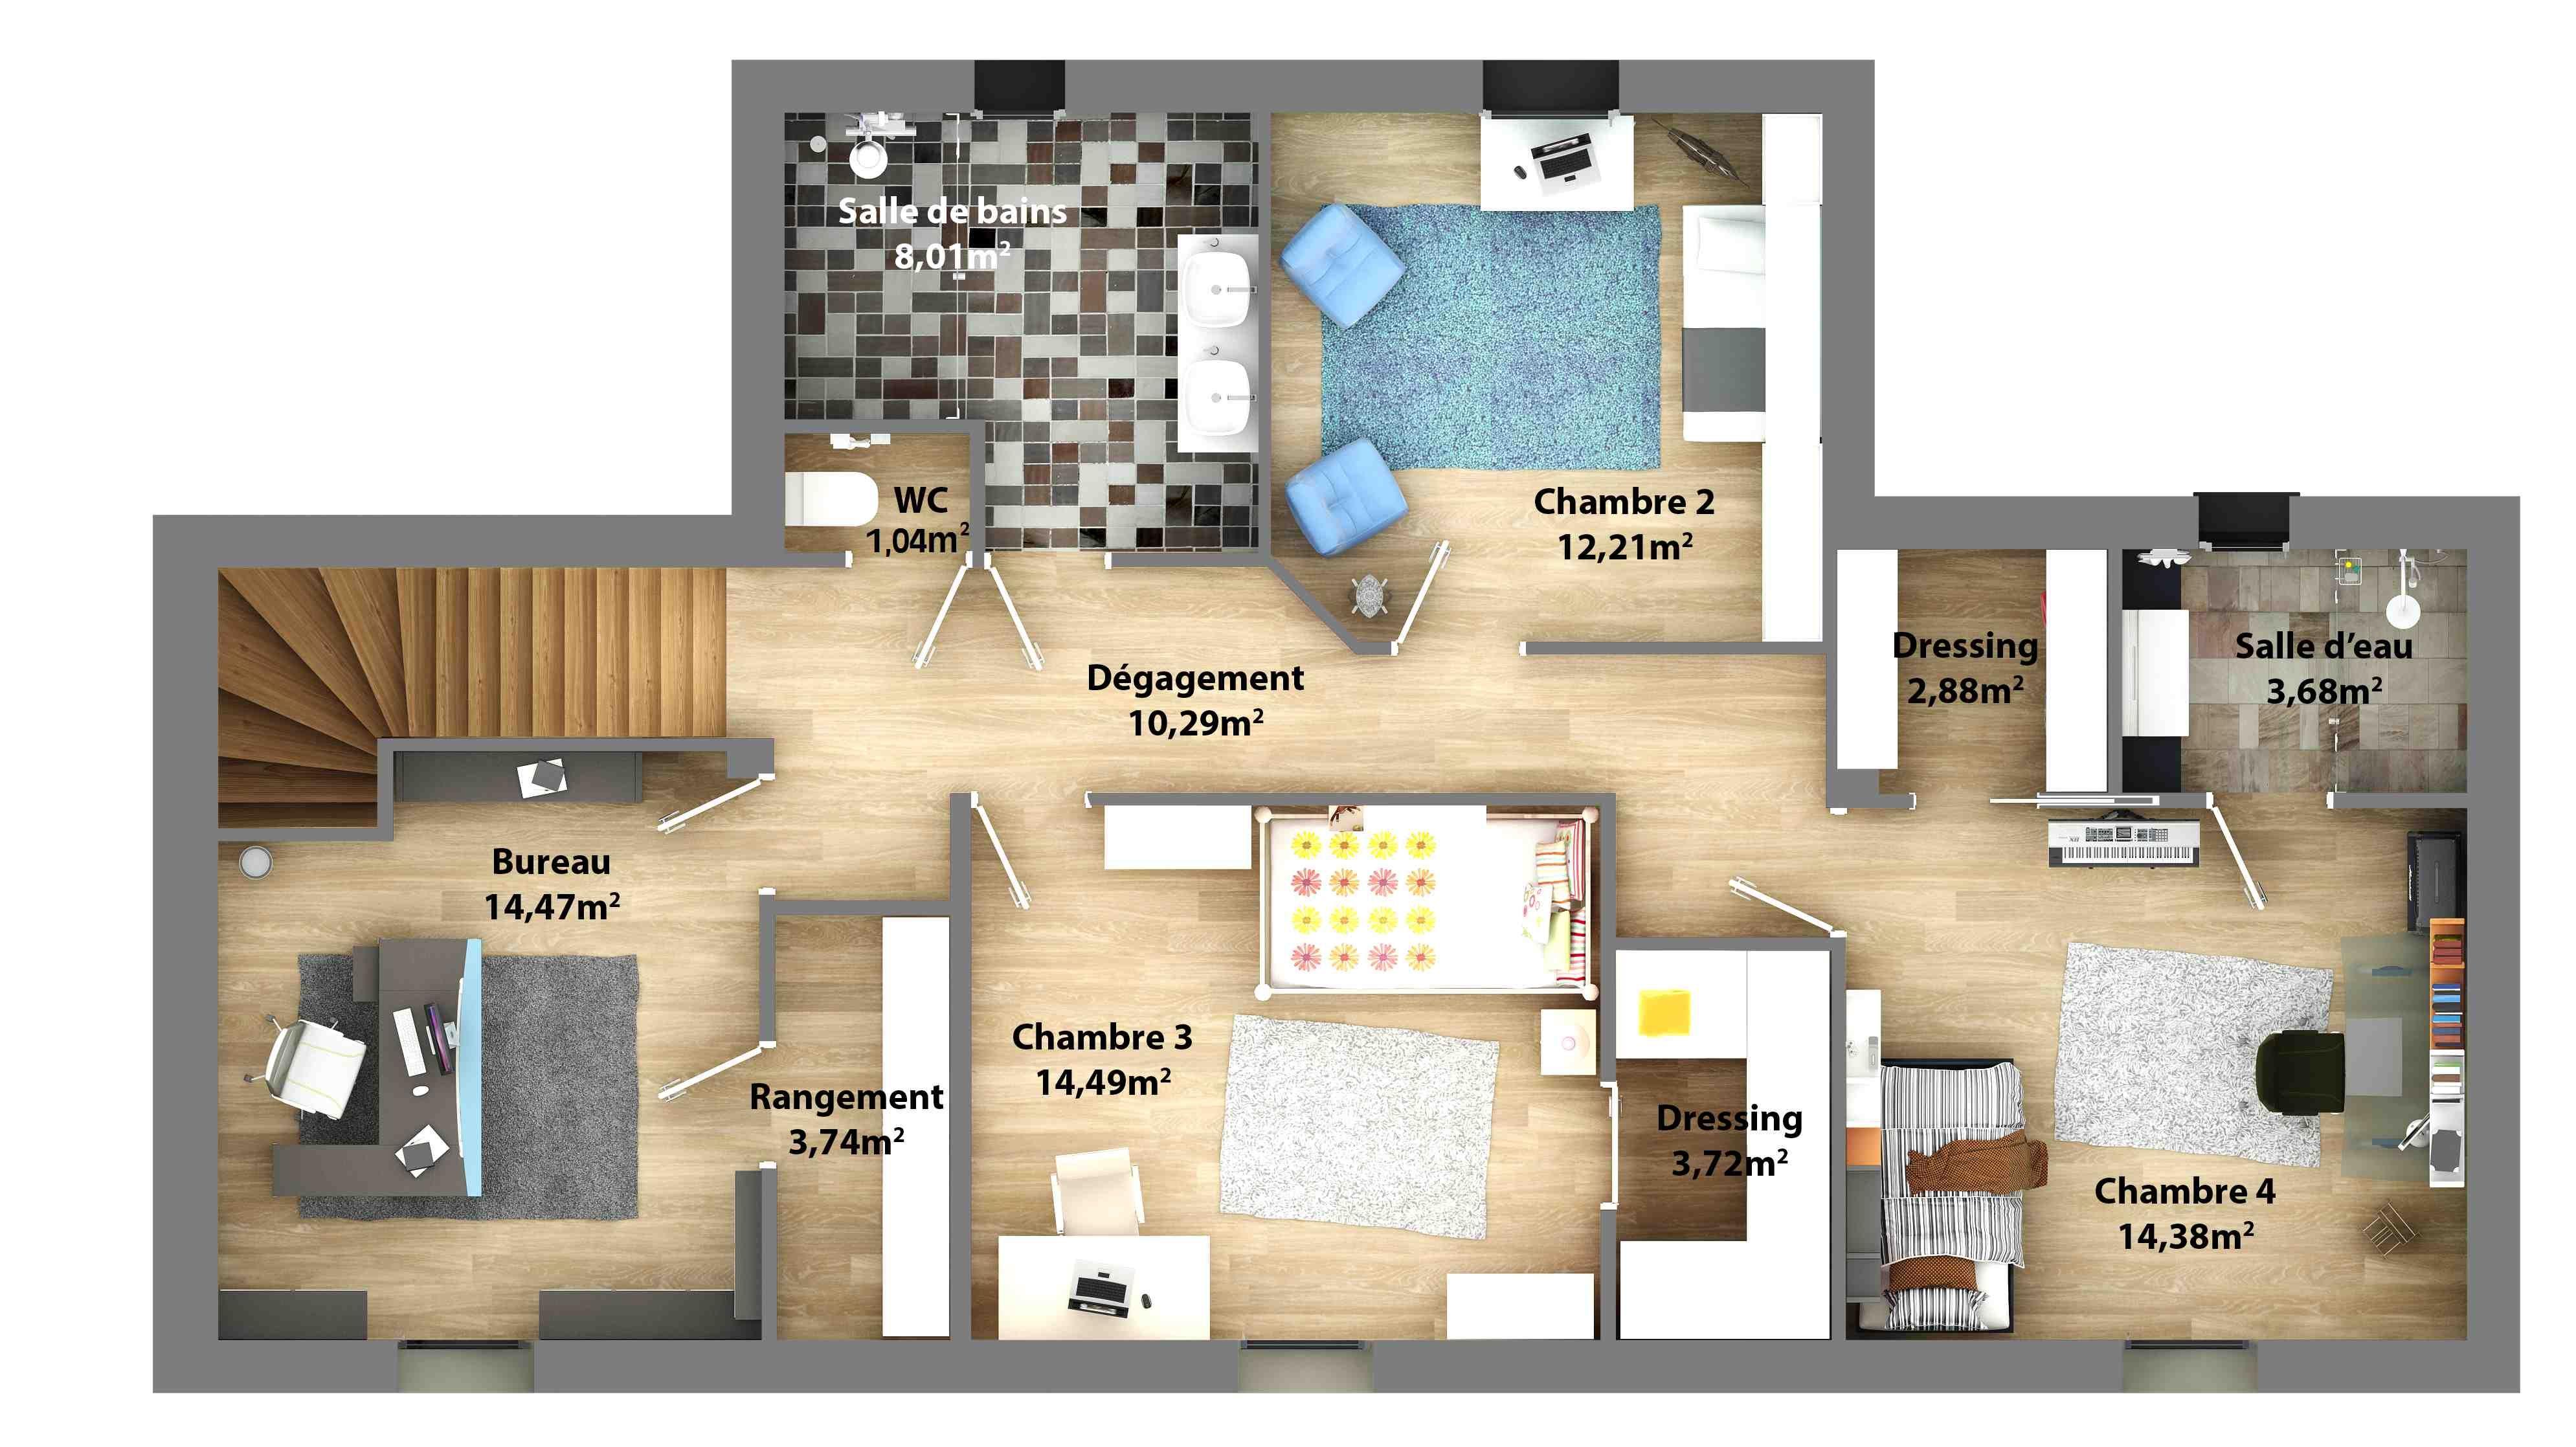 loft-2-plan-maison-etage.jpg (3979×2235) | Plan maison, Plan maison 3d, Plan maison 4 chambres